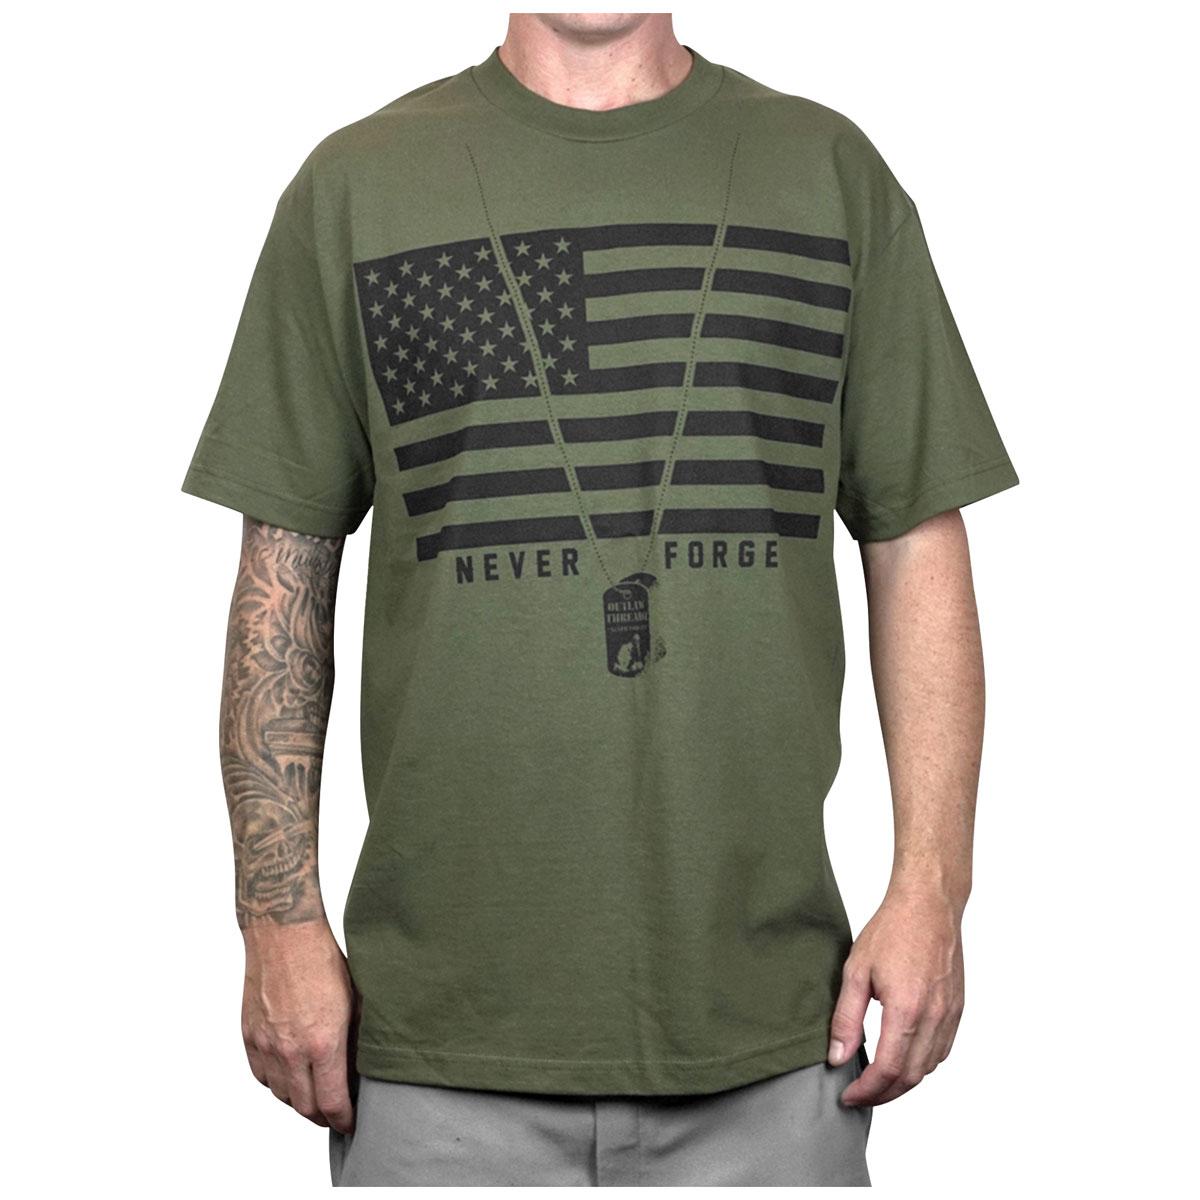 Outlaw Threadz Men's Patriot Green T-Shirt